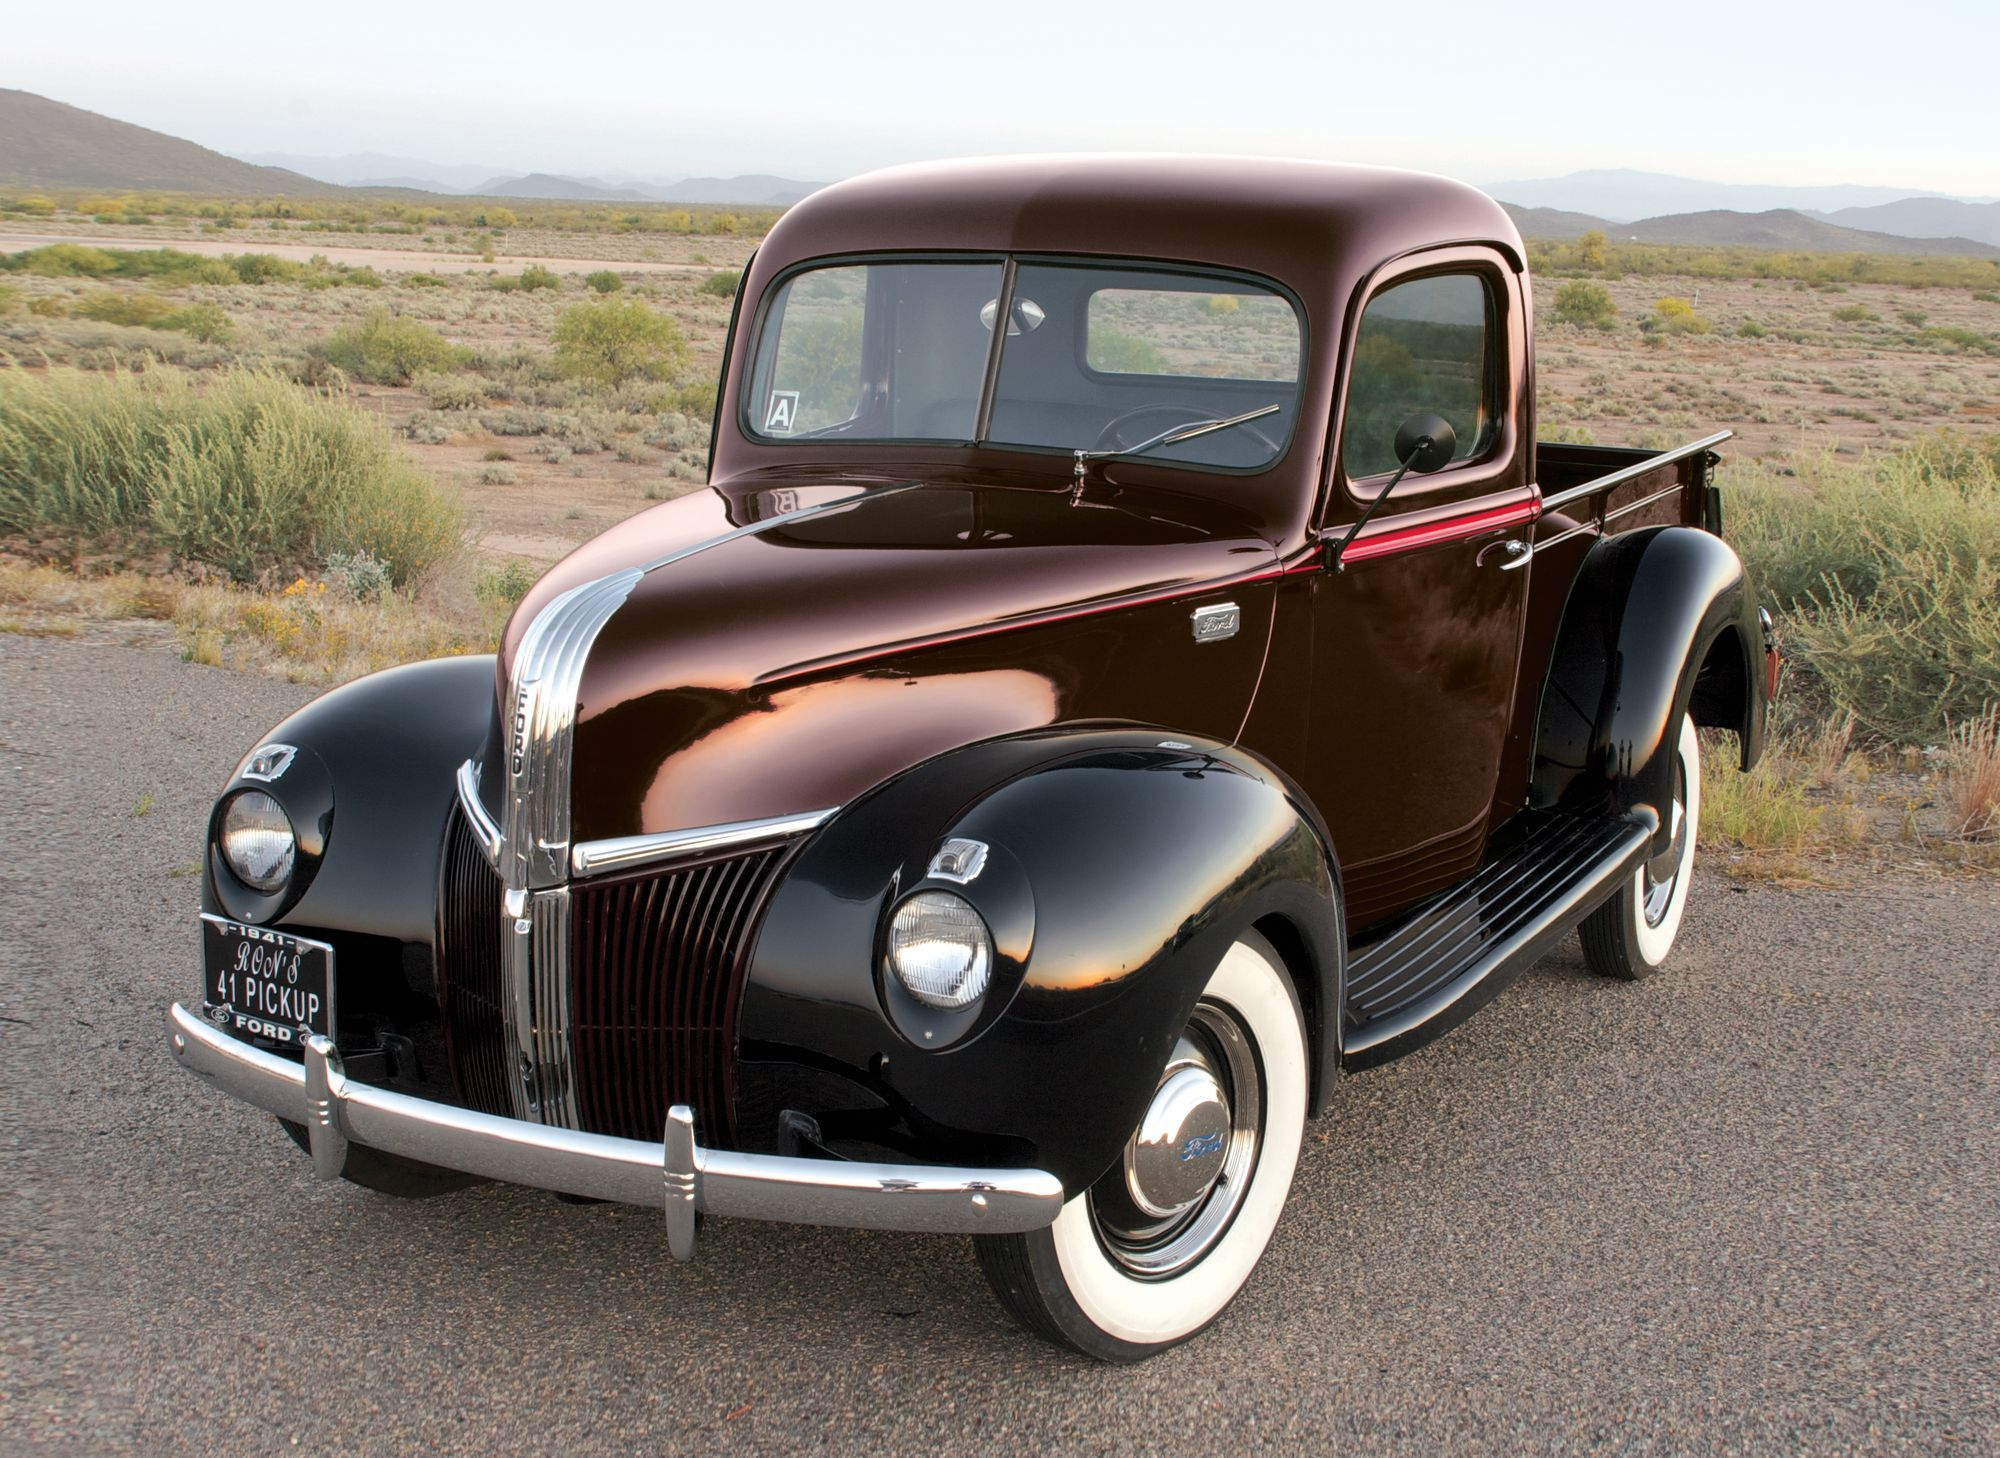 Ron Jensen 1933 2012 Cars Pinterest Trucks And Ford 1950 Hudson Wiring Diagram 1941fordpickup 02 2000